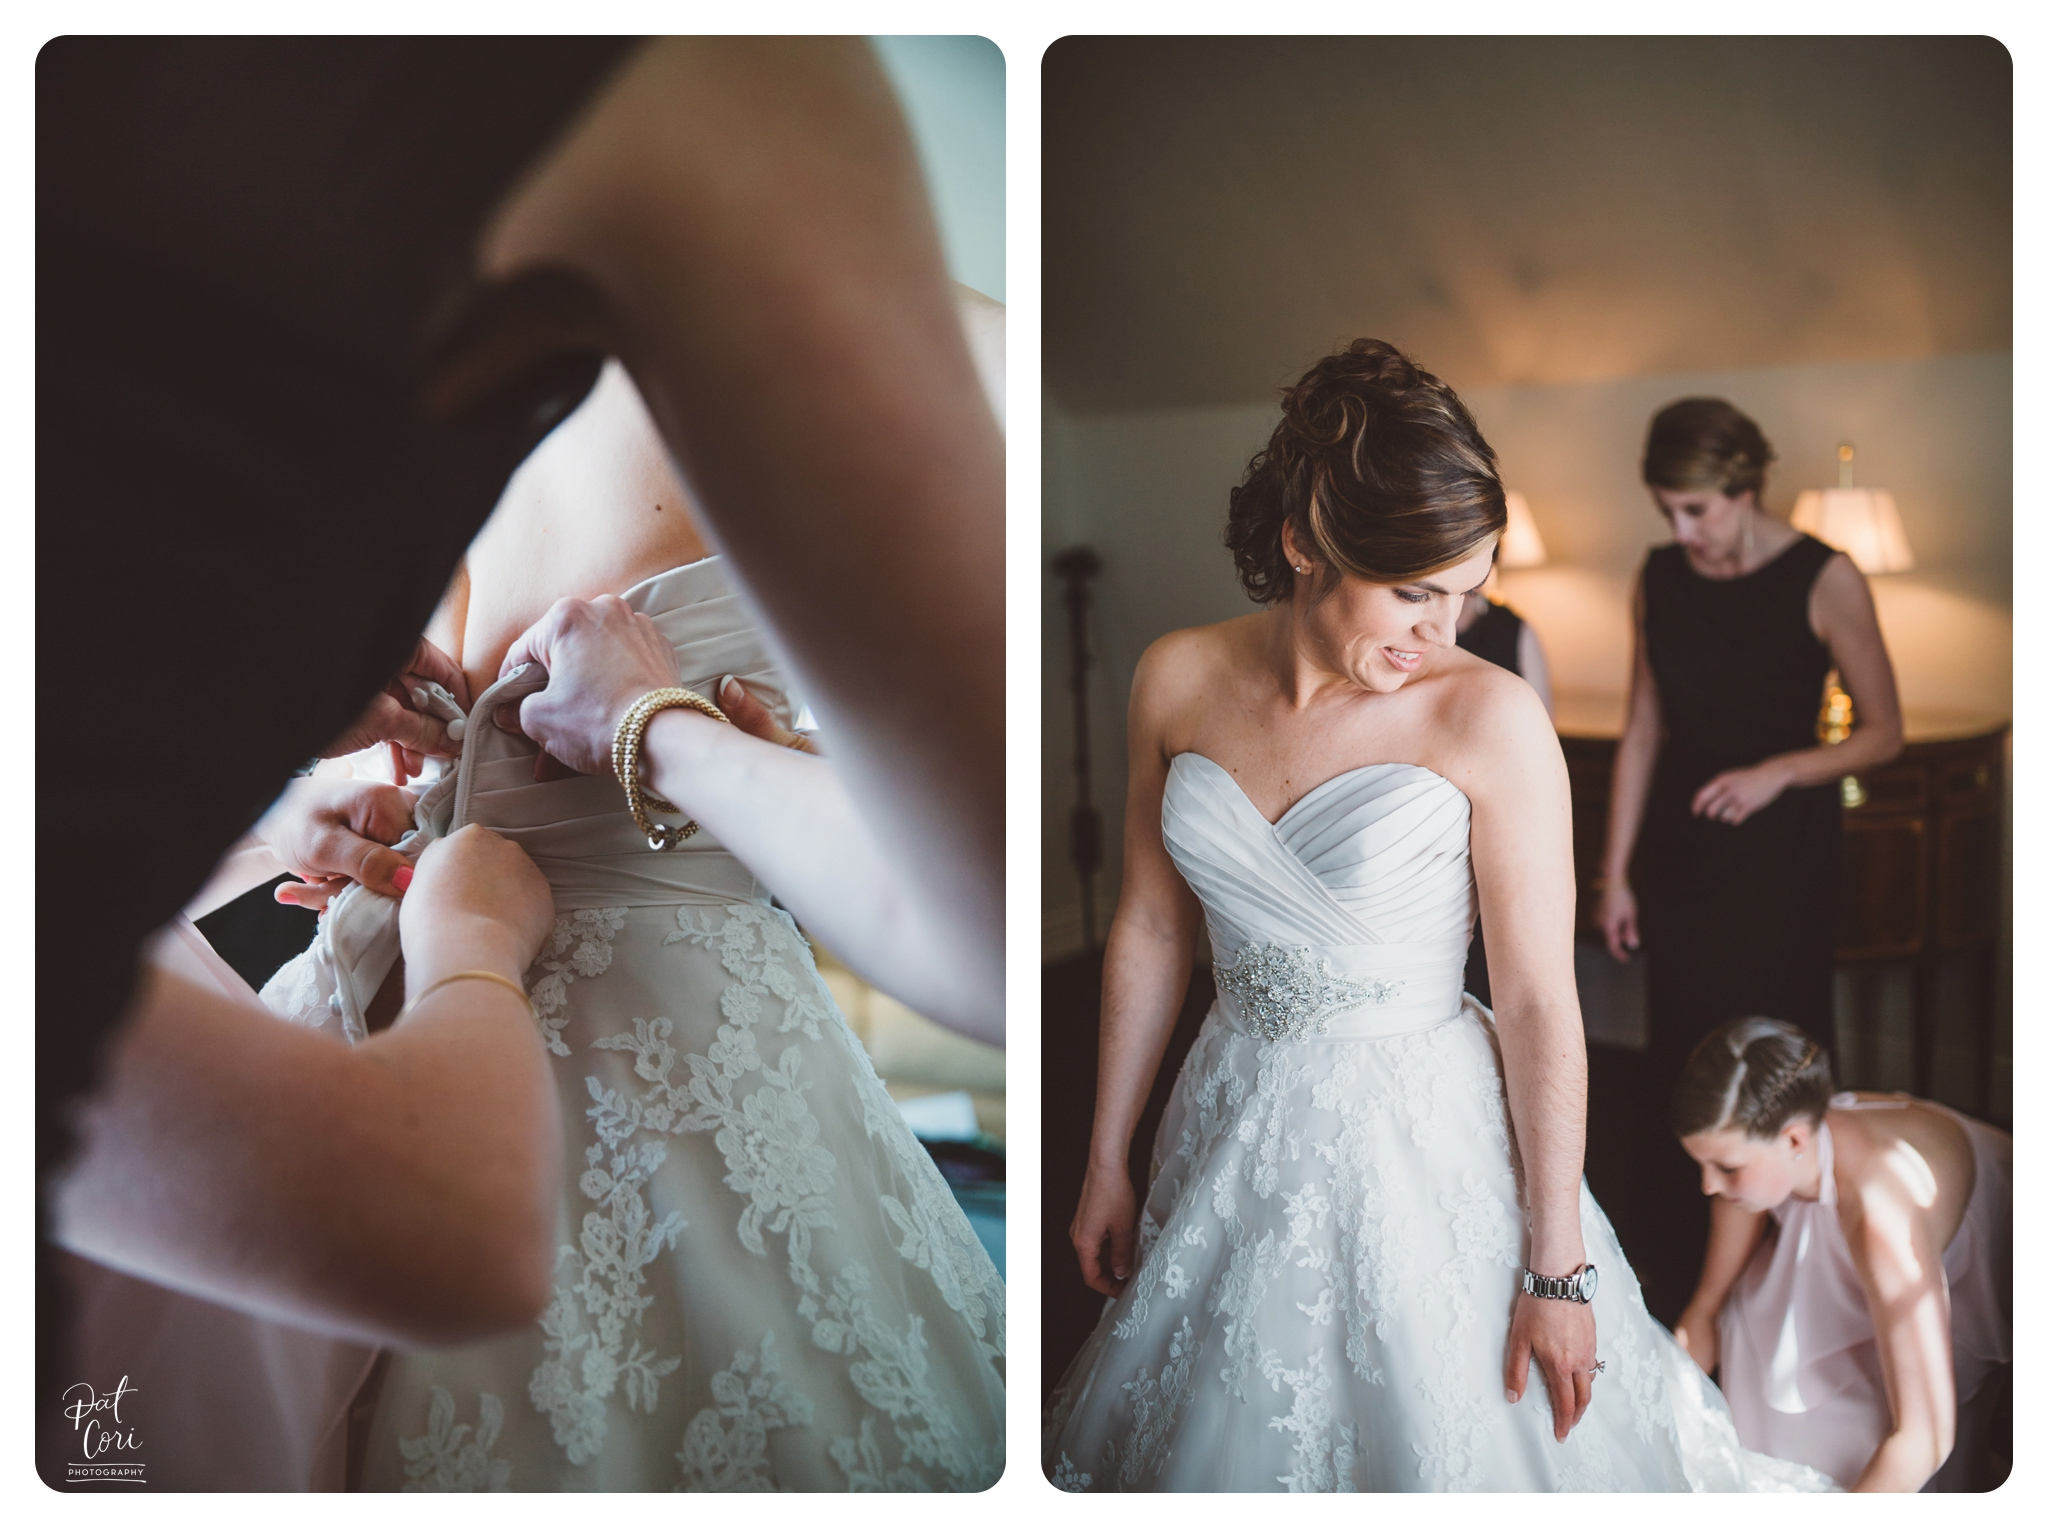 Center-in-the-Square-_-Weddings-Wedding-Photographer-Virginia-001-1.jpg